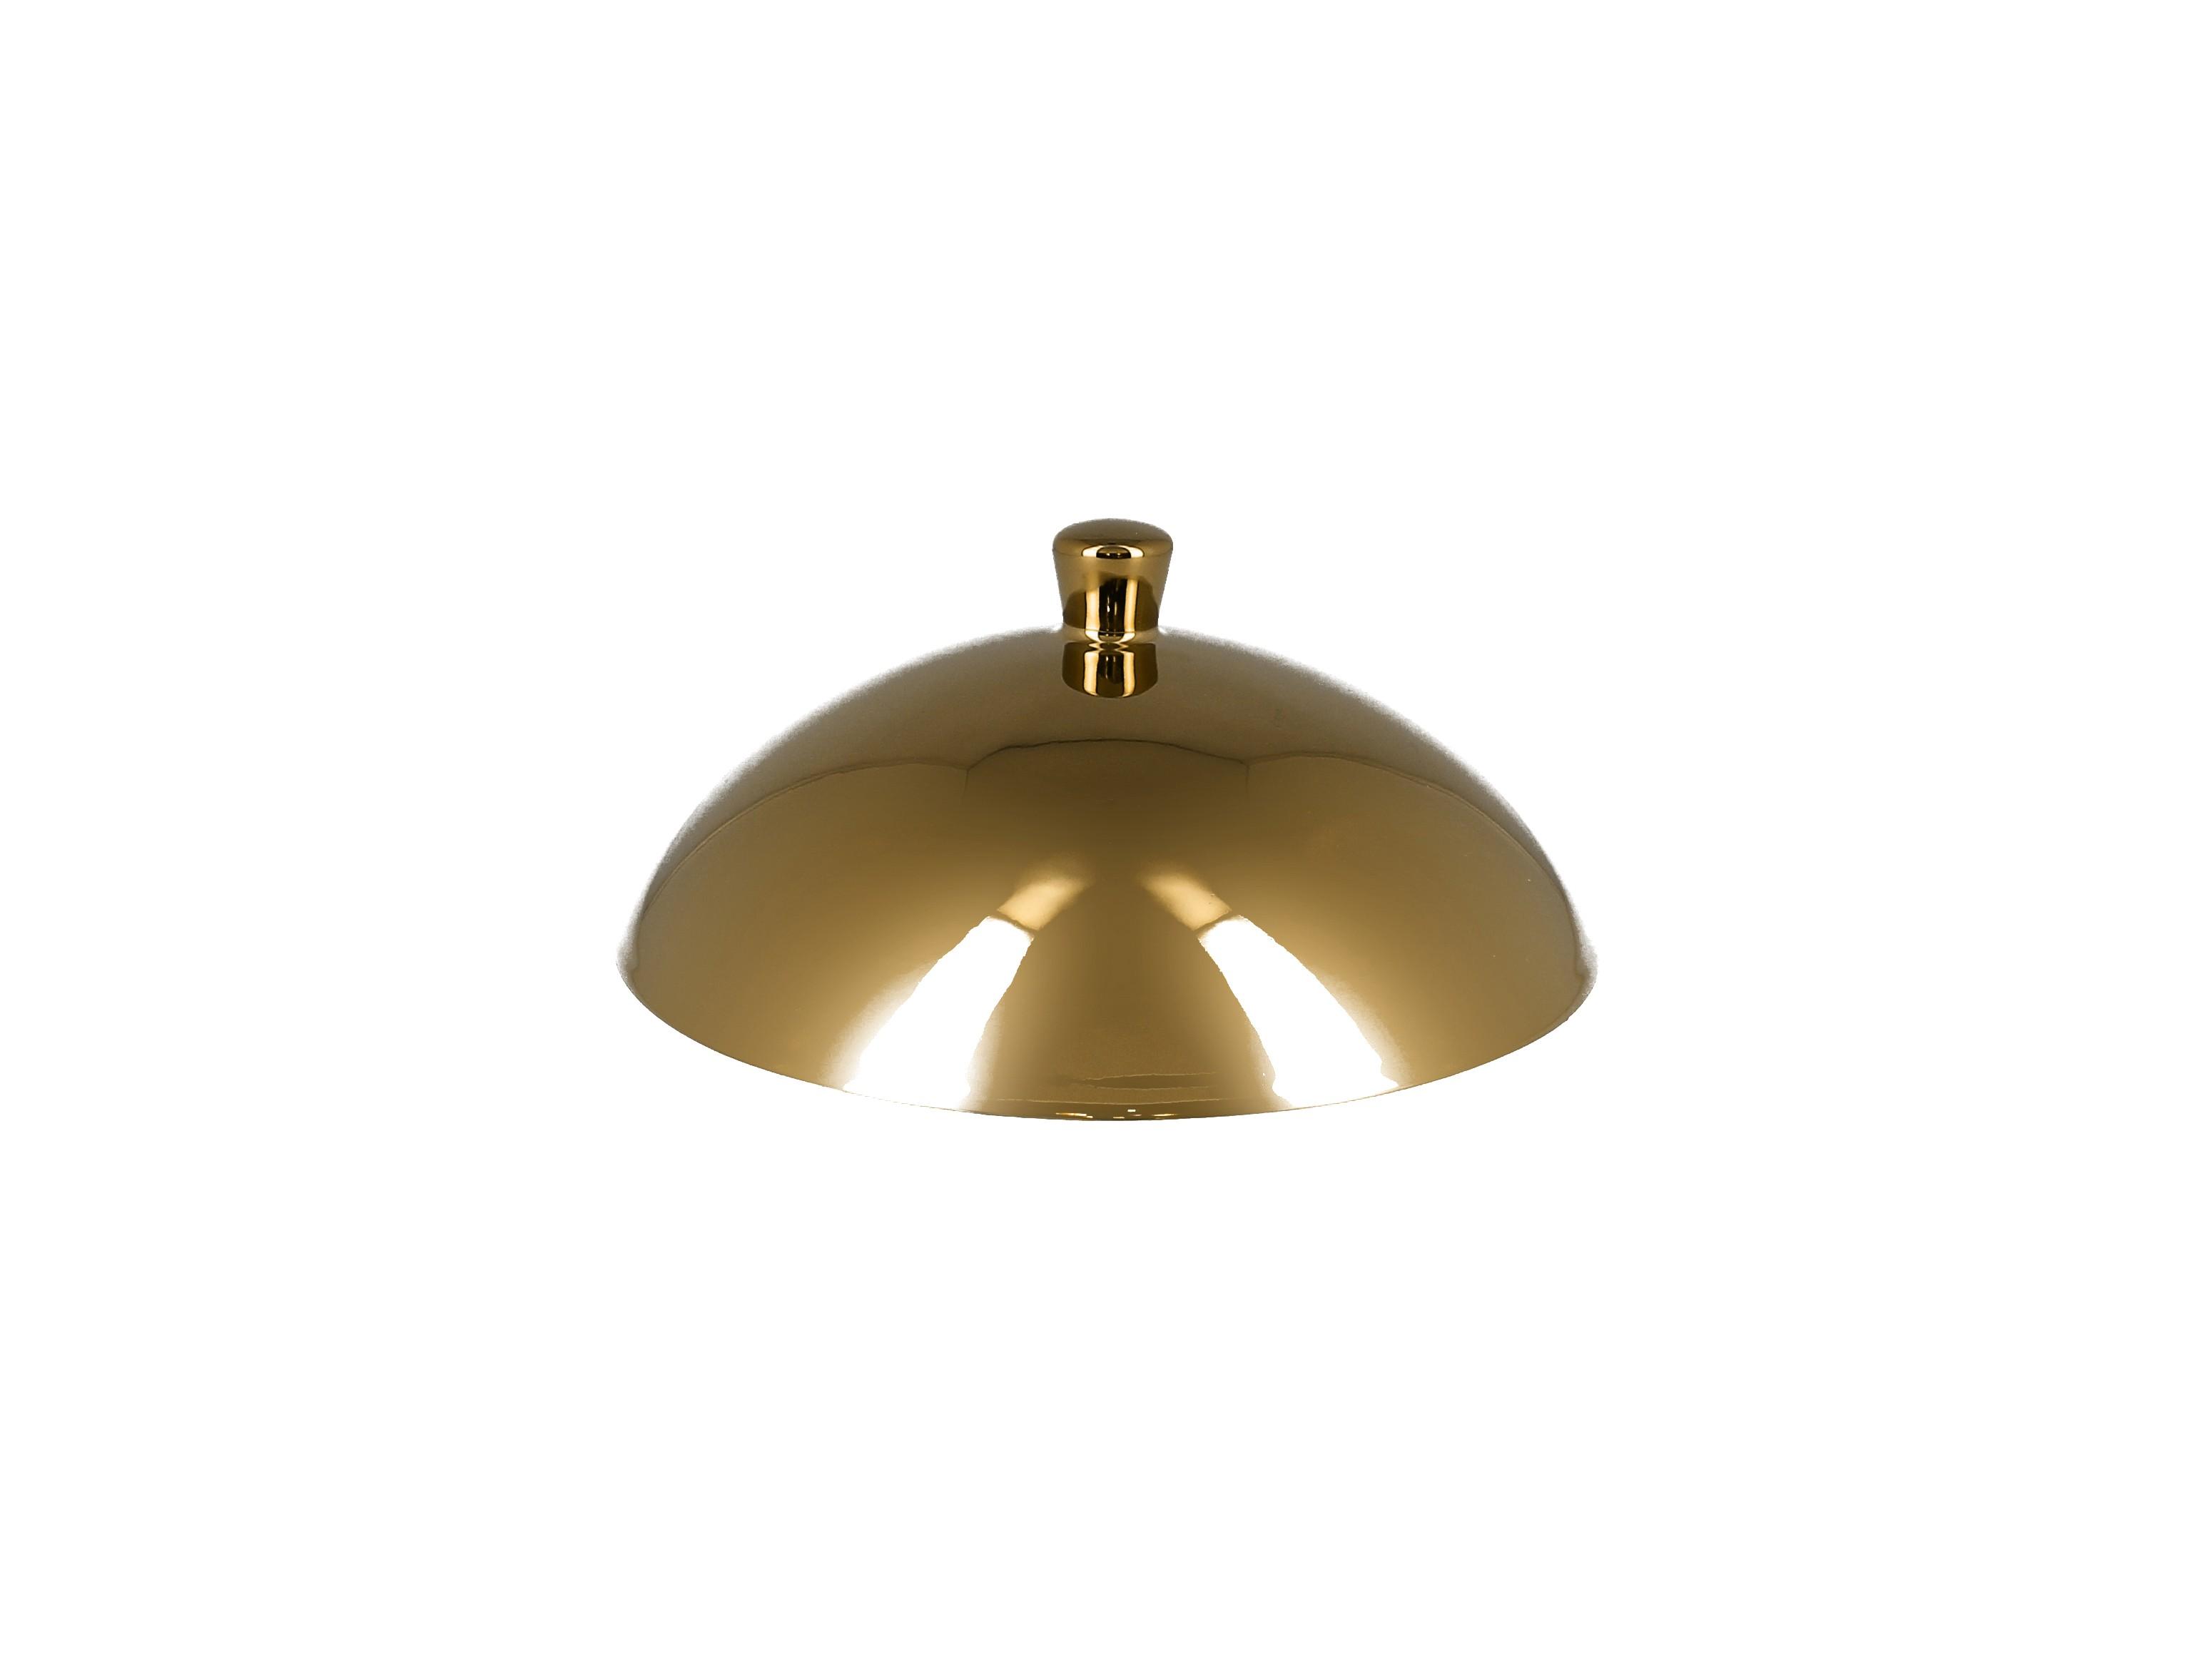 RAK | Metalfusion poklička pro talíř hluboký Gourmet pr. 13,6 cm, zlatá